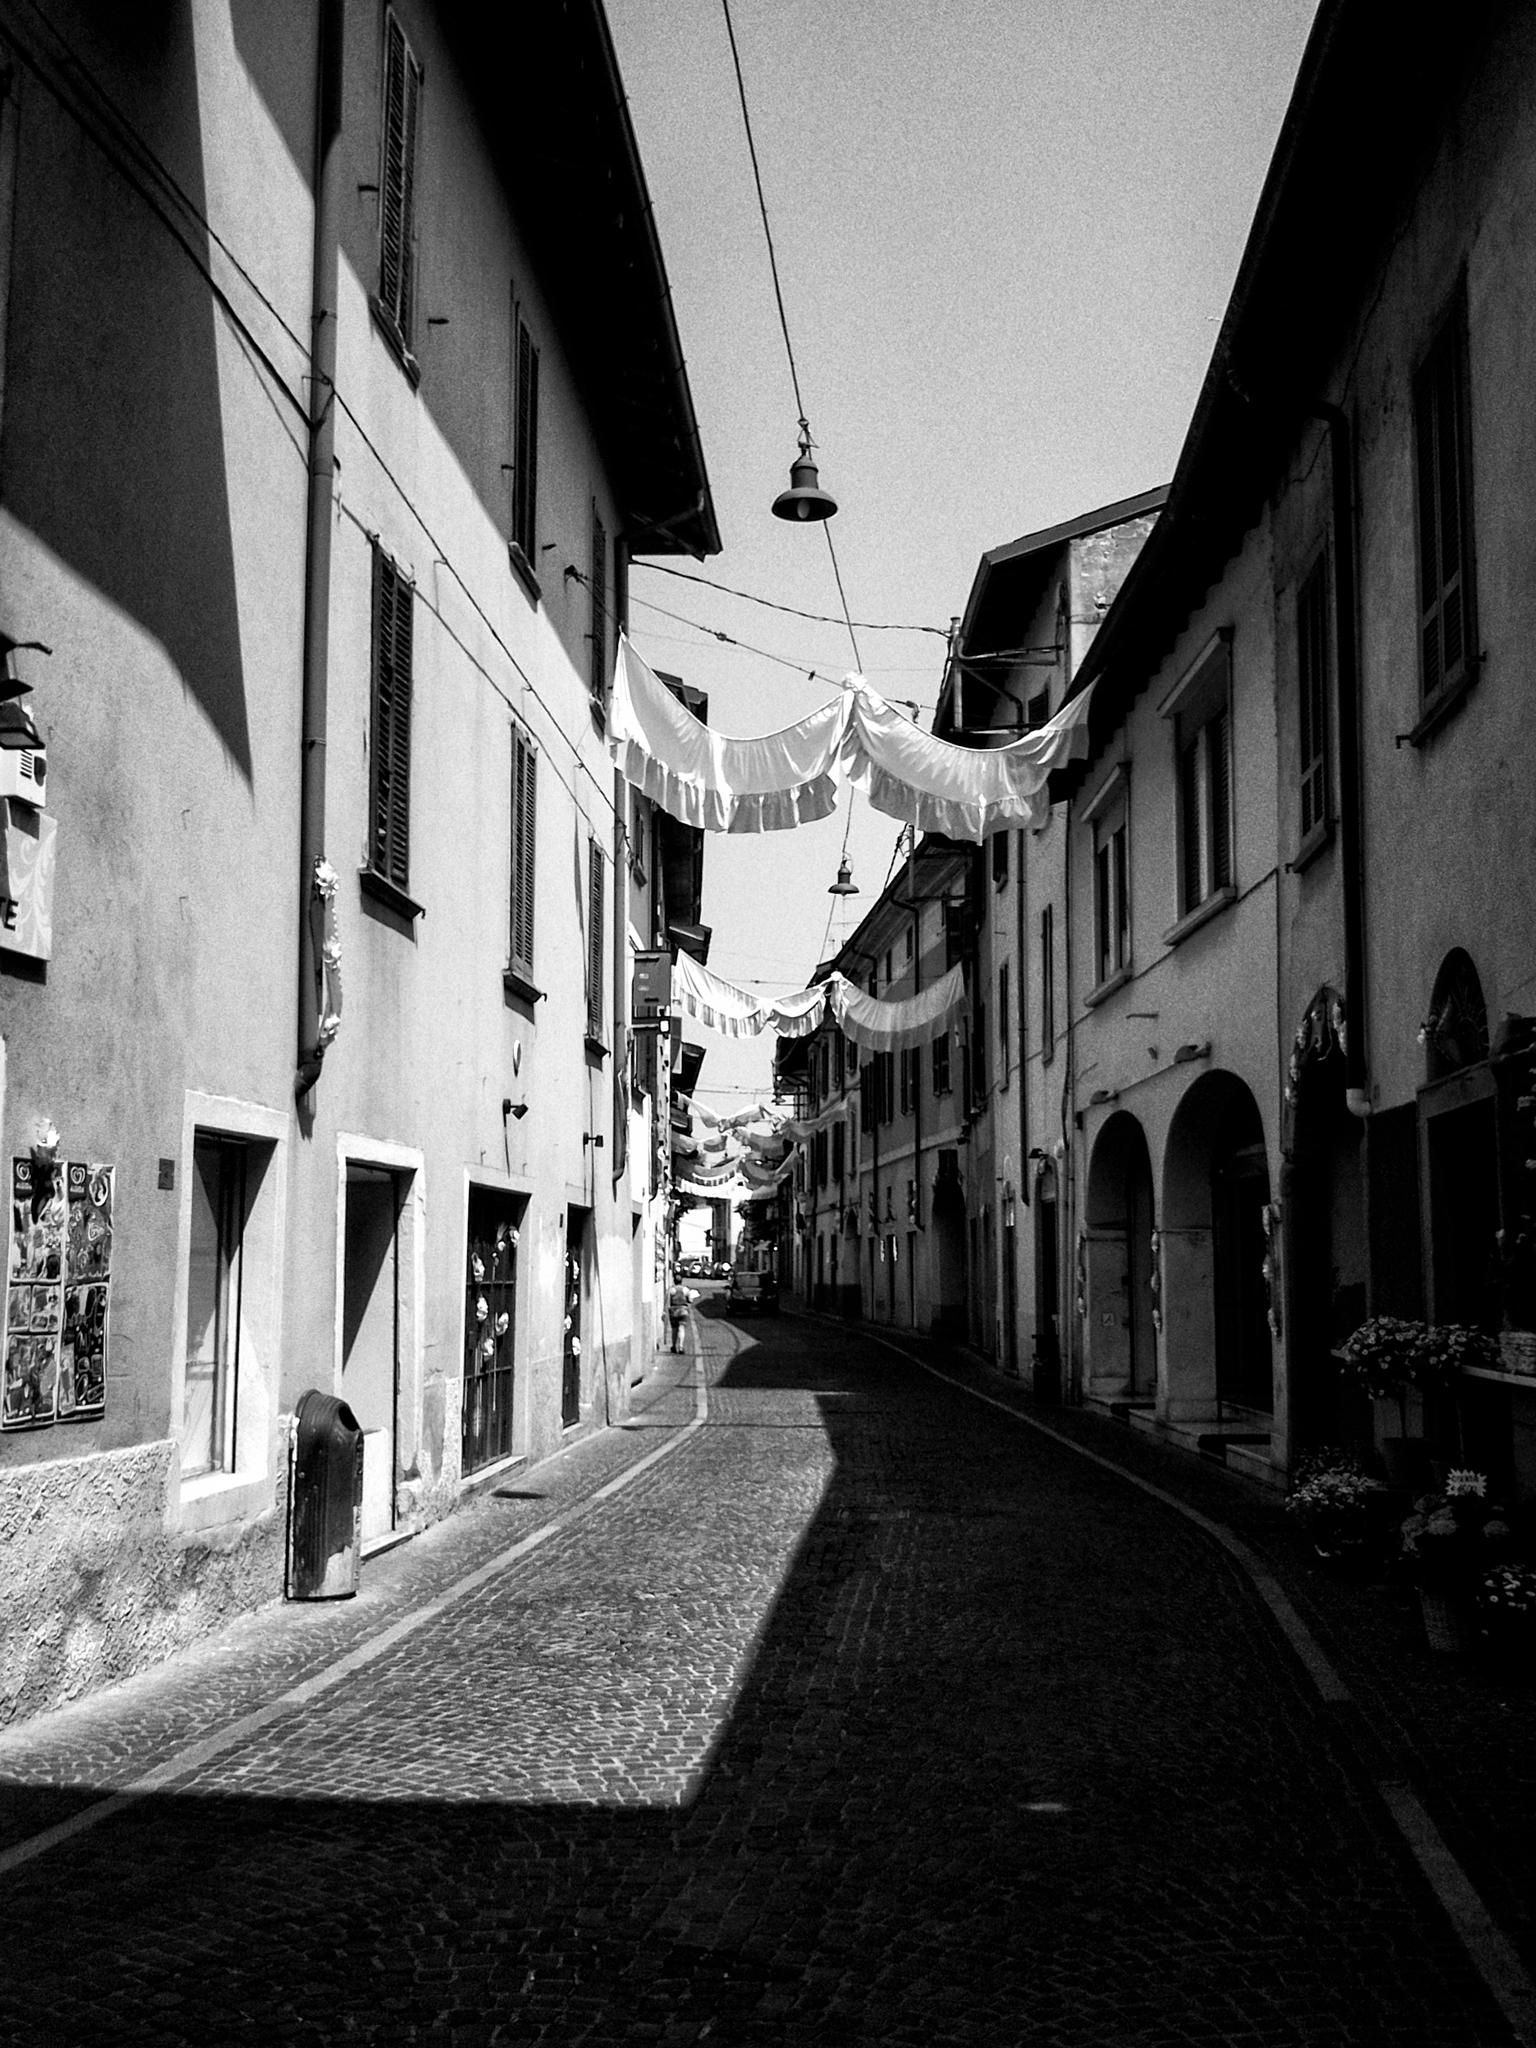 Sun & Shadow by Nazzareno Gritti